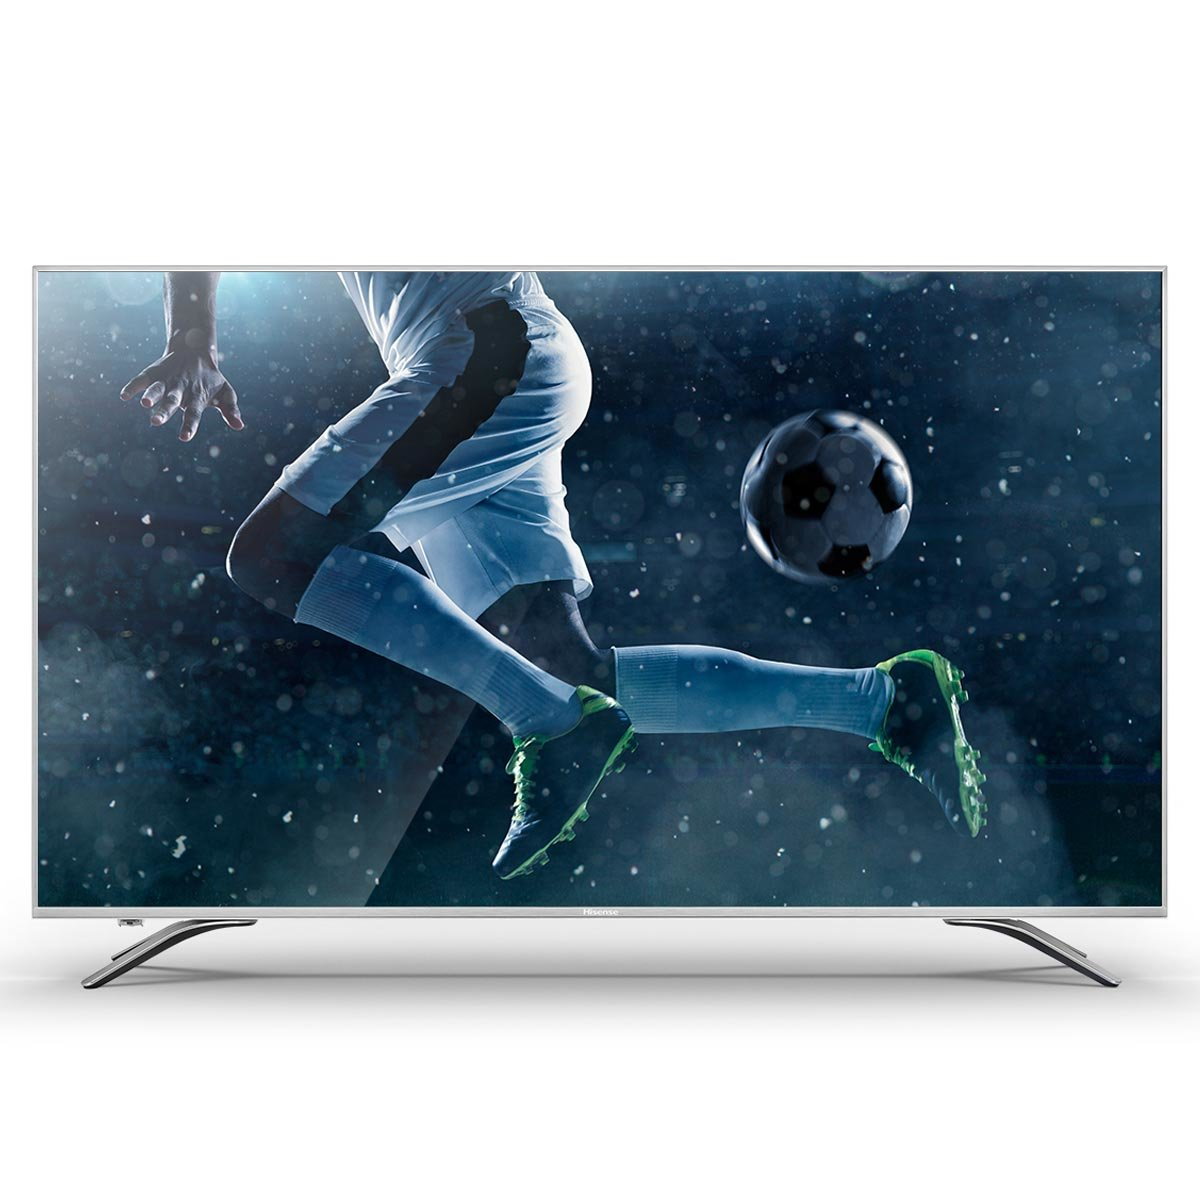 Image result for hisense 55-inch 4k smart tv